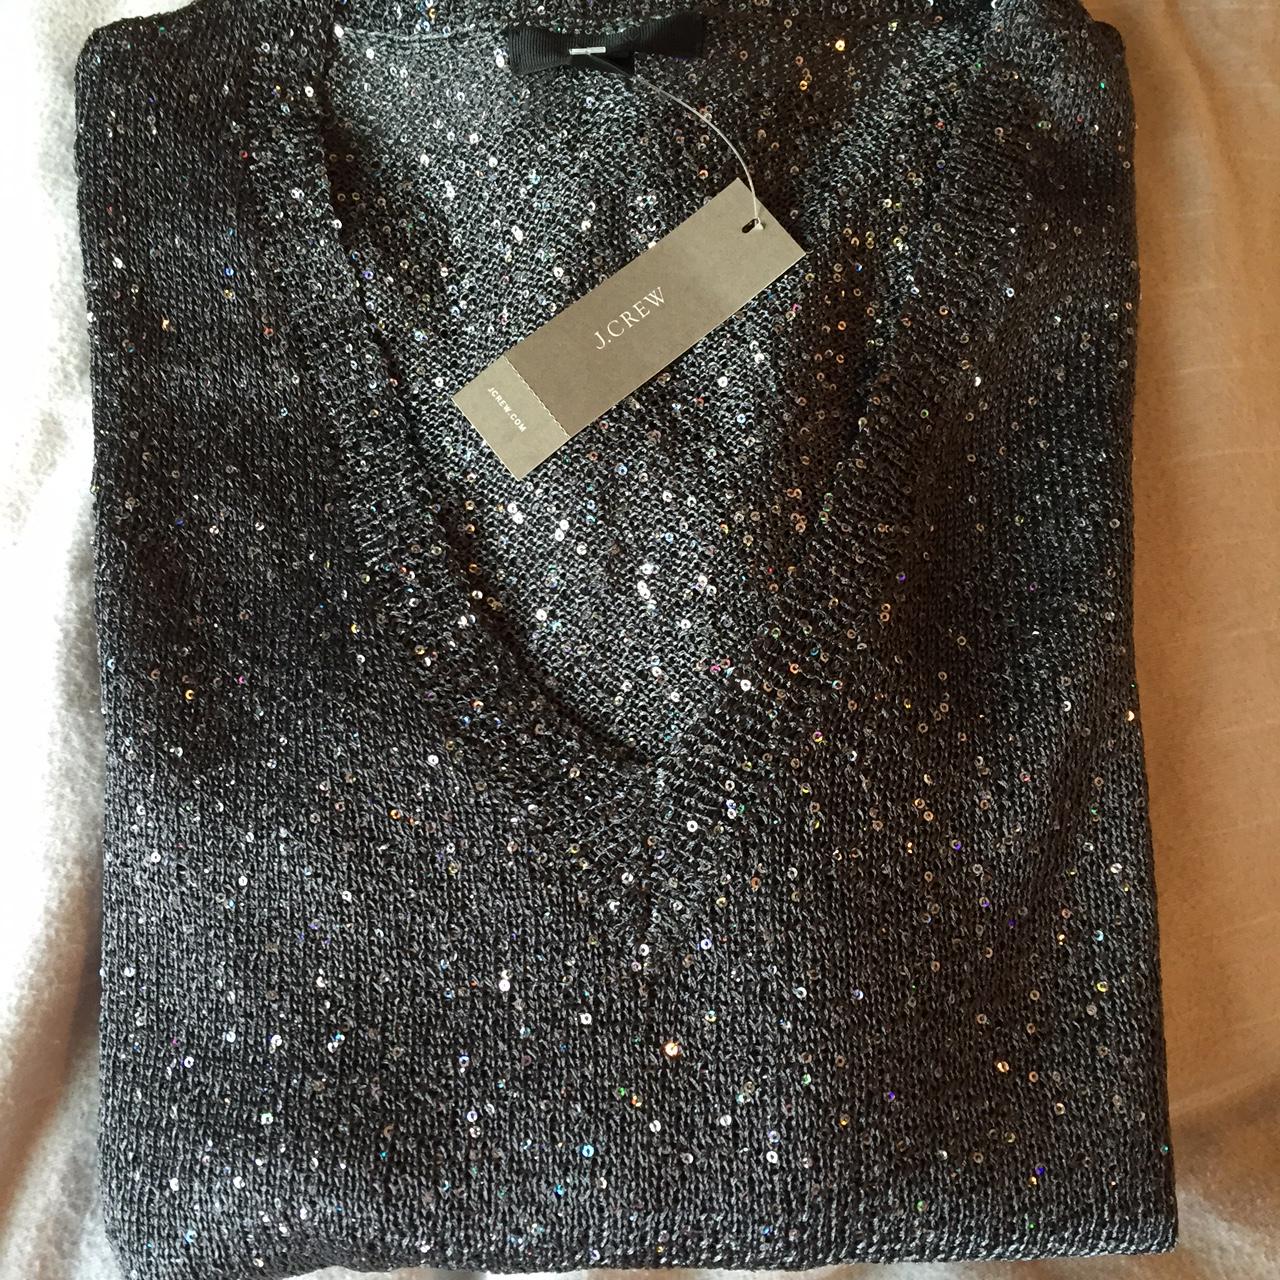 J Crew Shimmer Sweater Fancyladydoctor